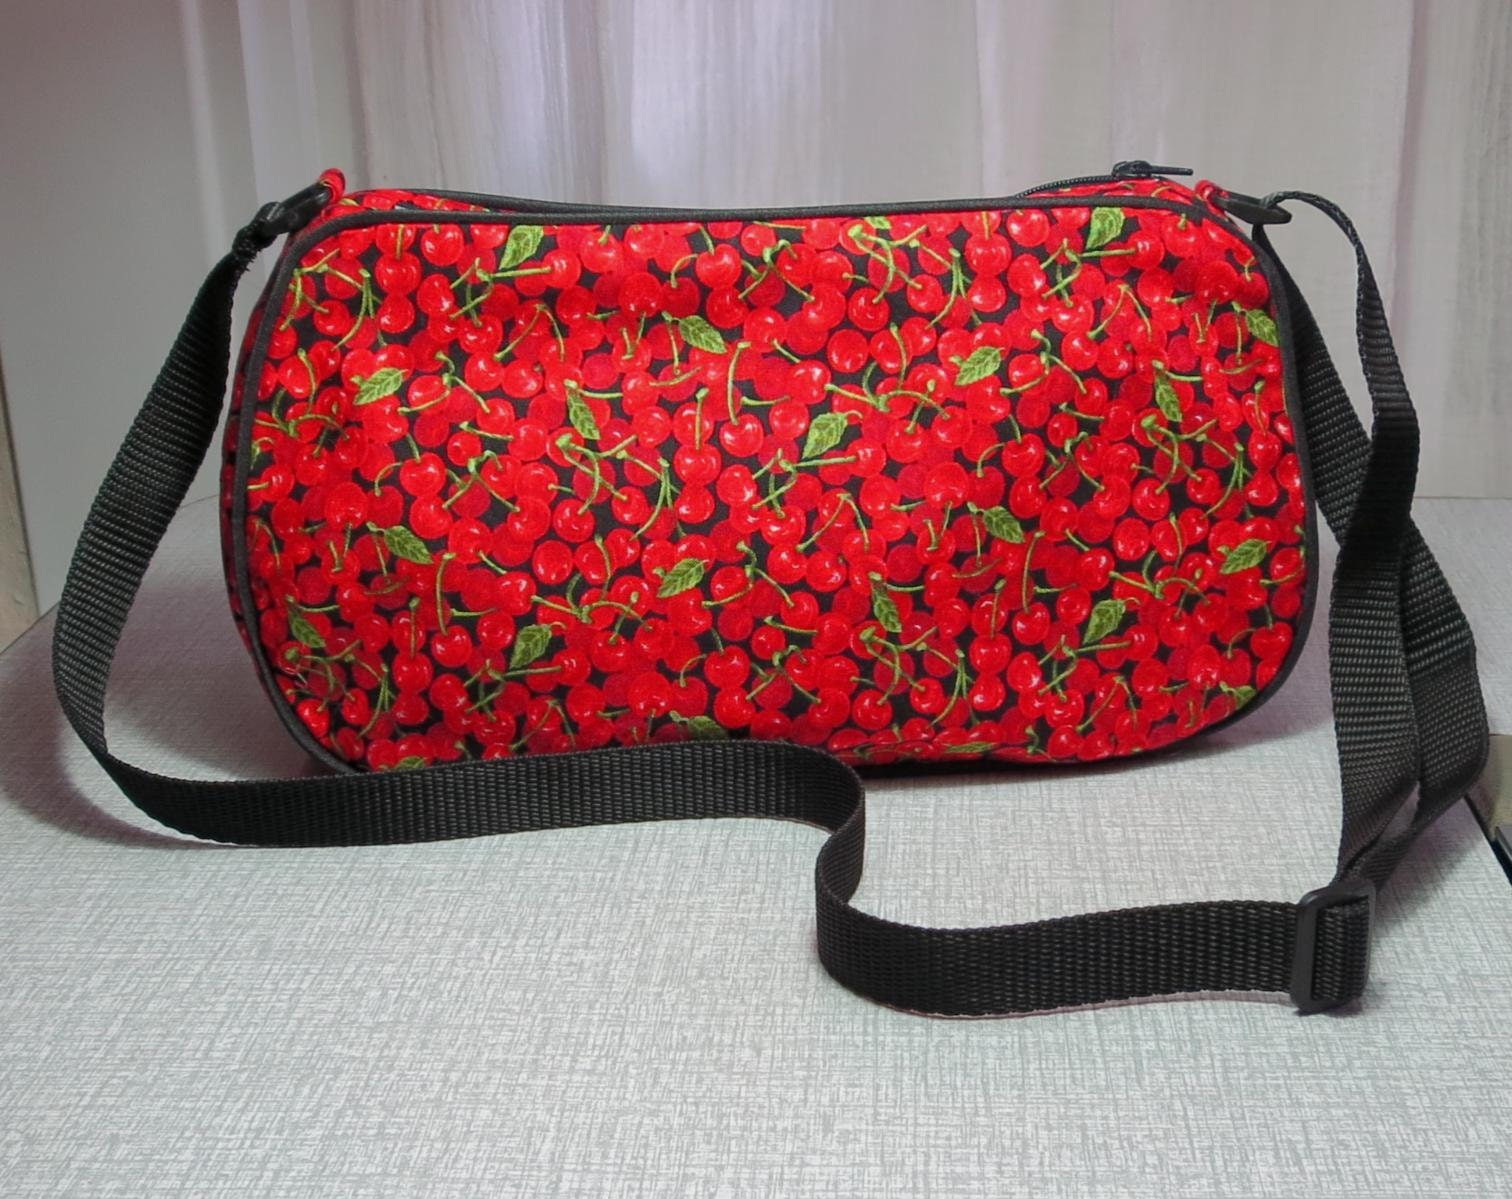 small cherry purse cherries handbag clutch bag with adjustable strap  UK seller